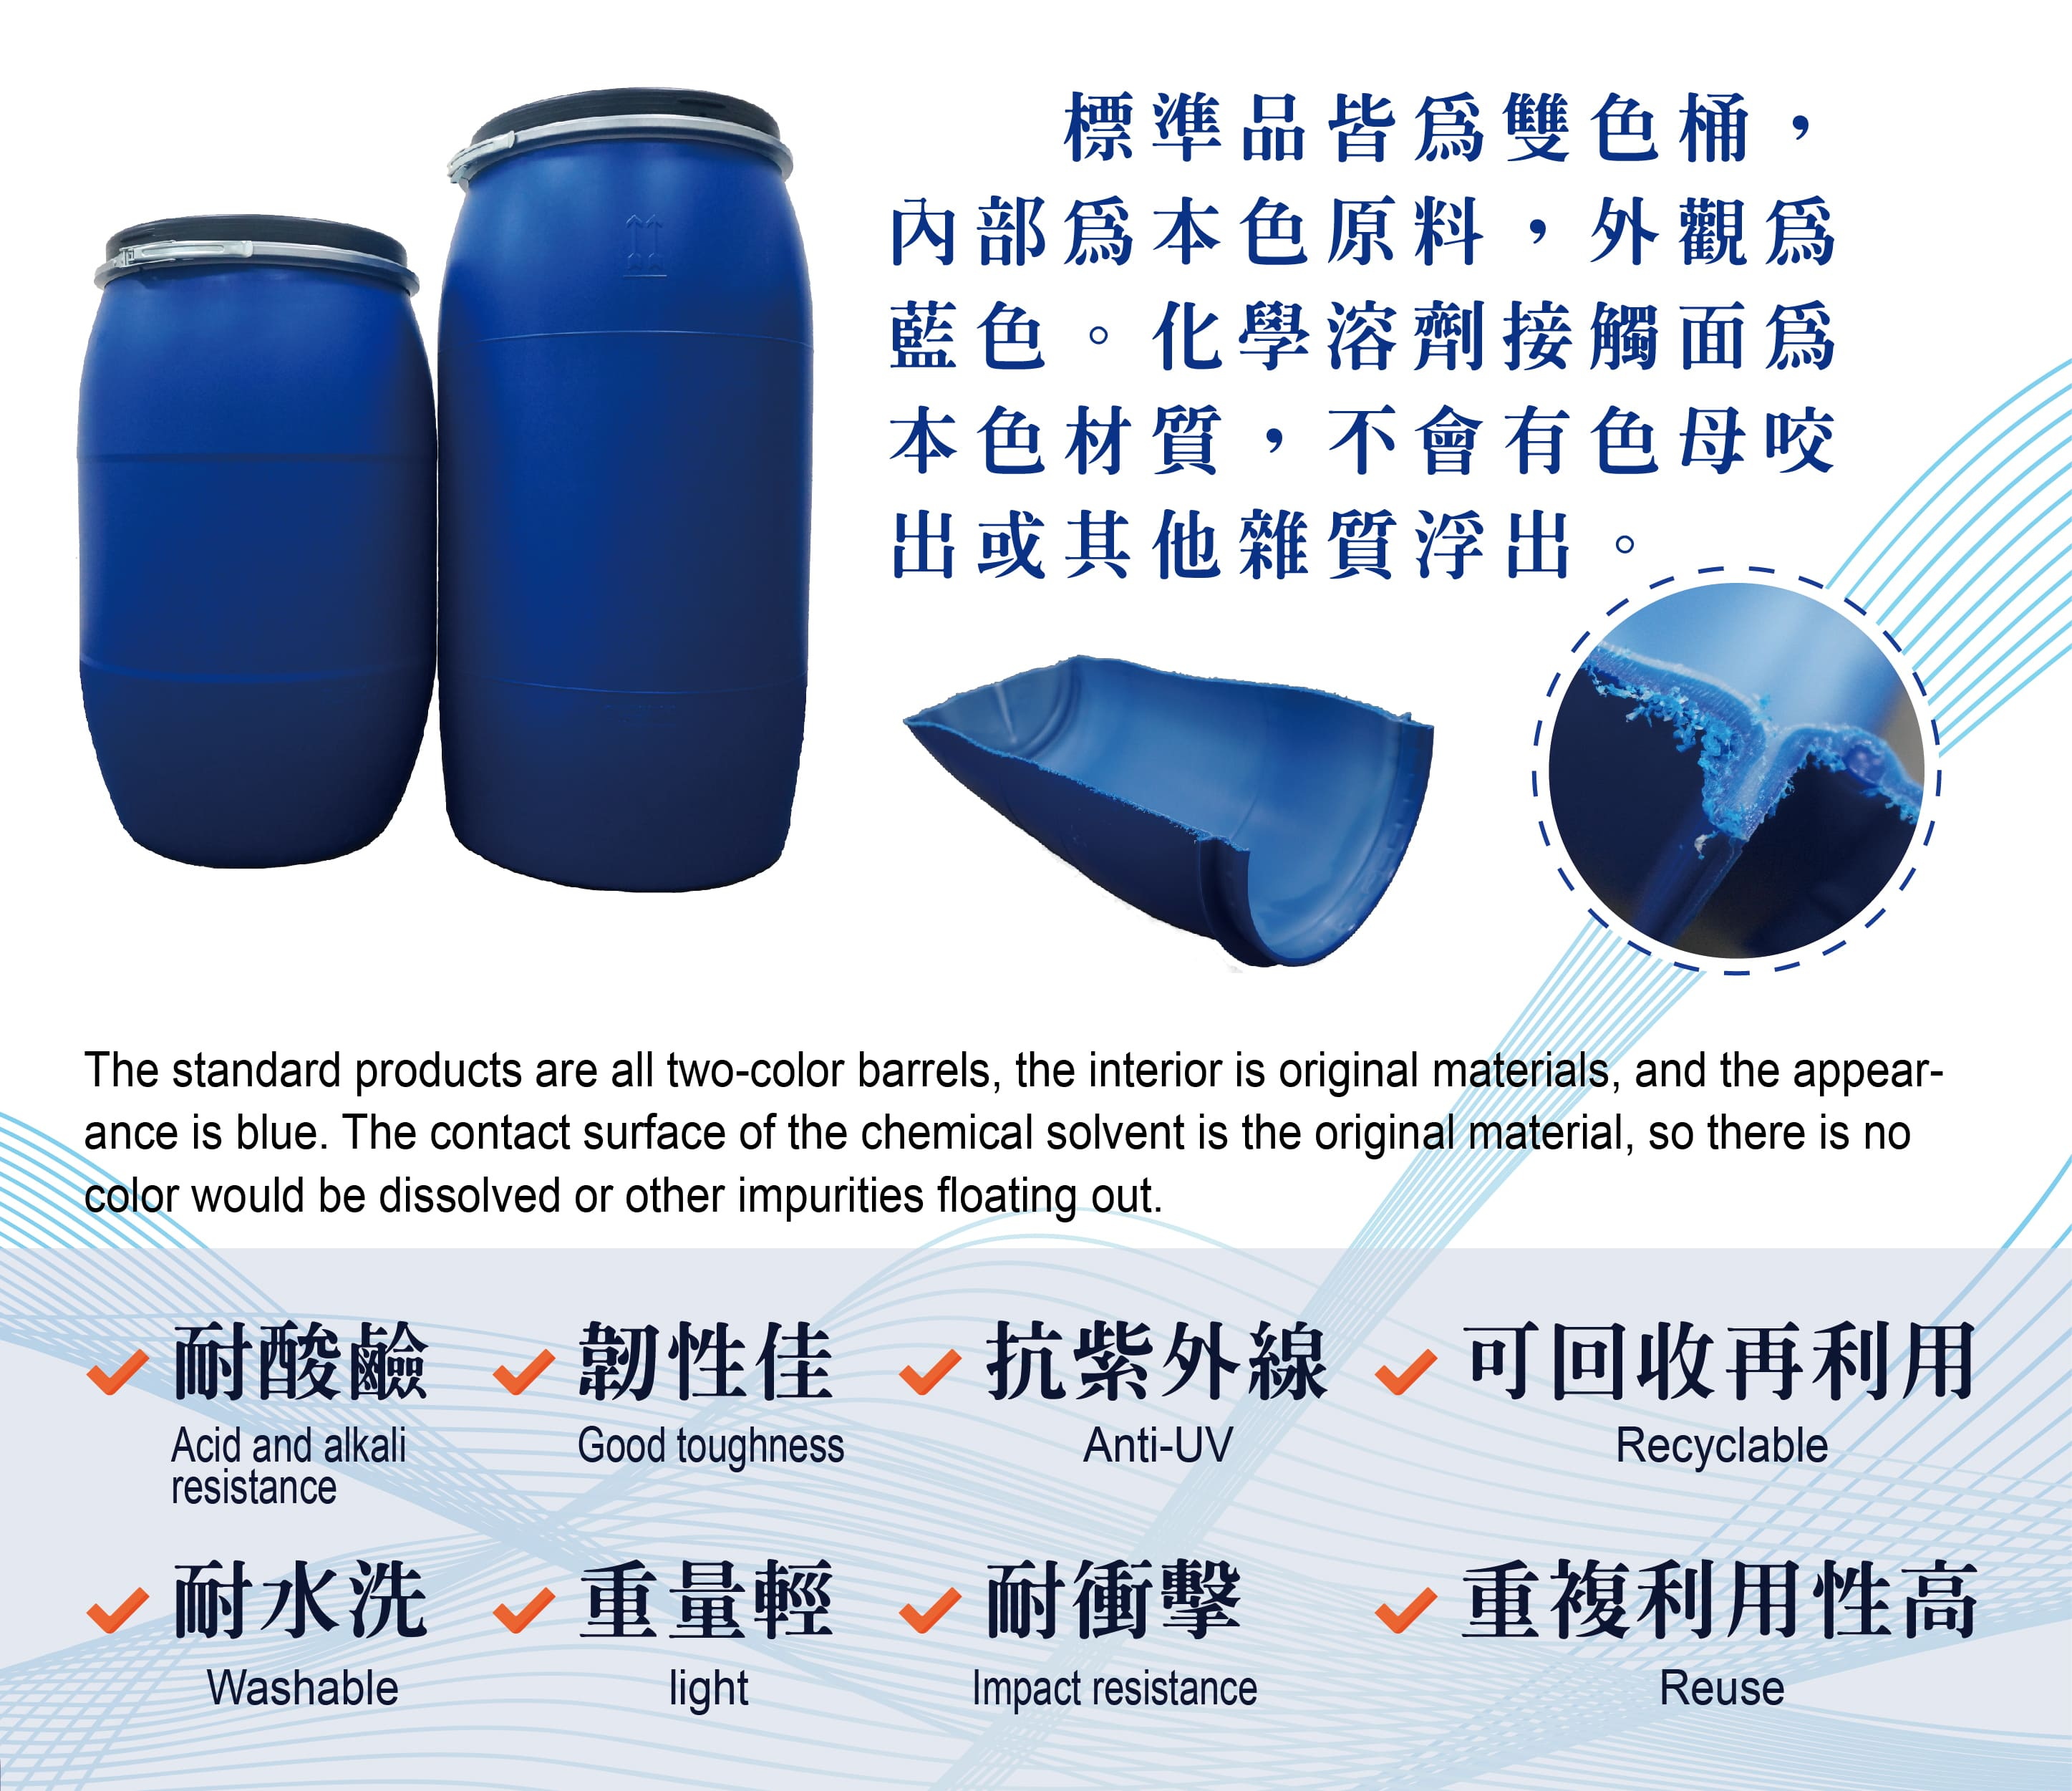 proimages/2020塑膠容器/塑膠桶特色介紹(壓縮).jpg